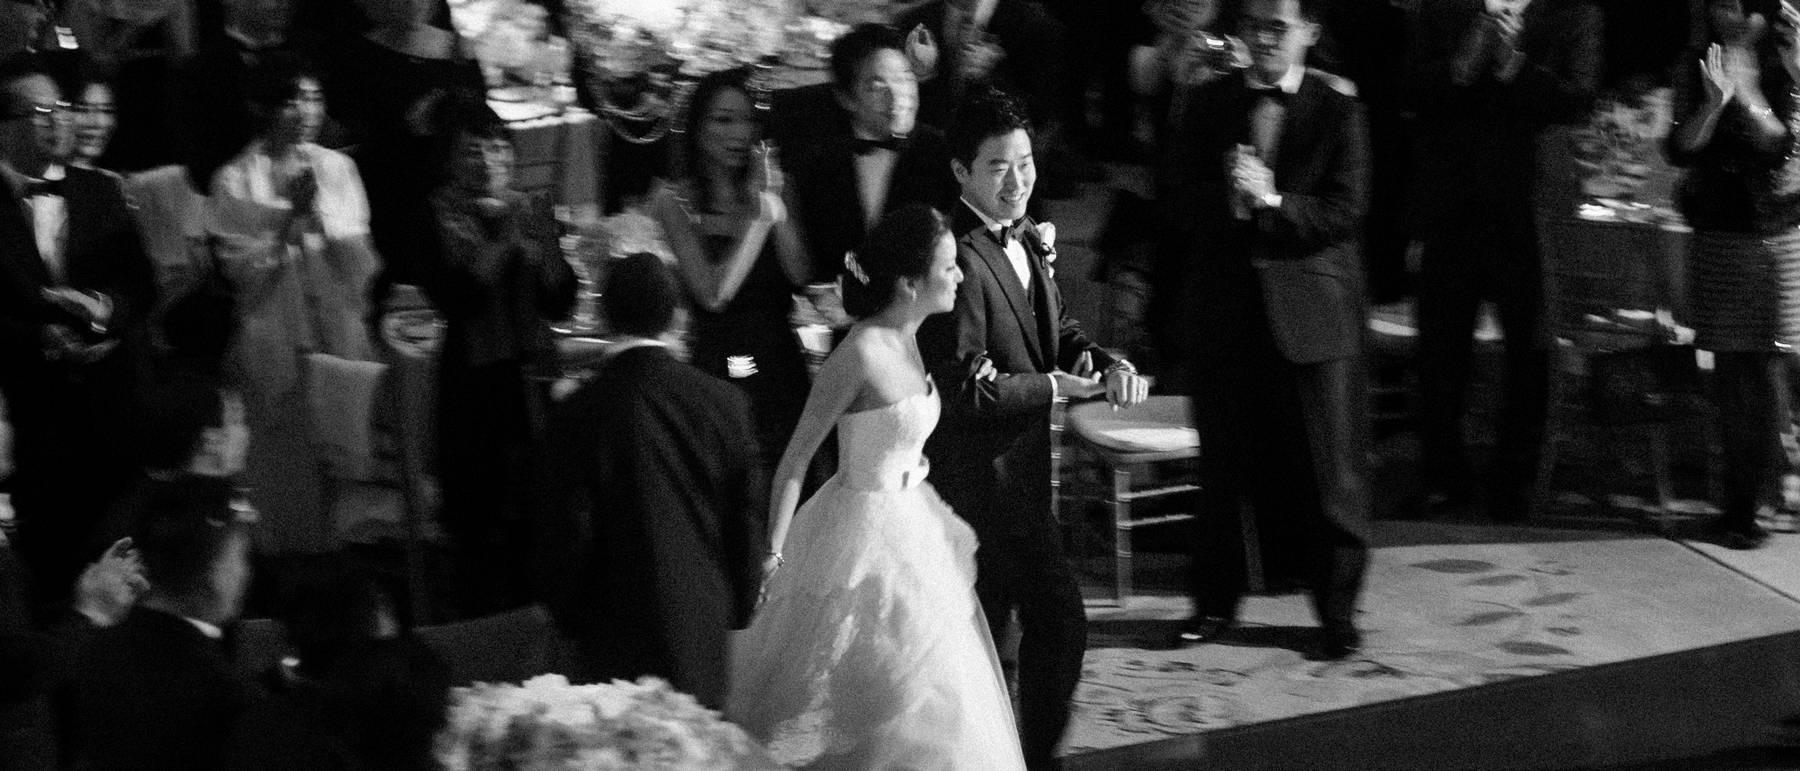 johnandjoseph-wedding-photographer-hz-slider-295